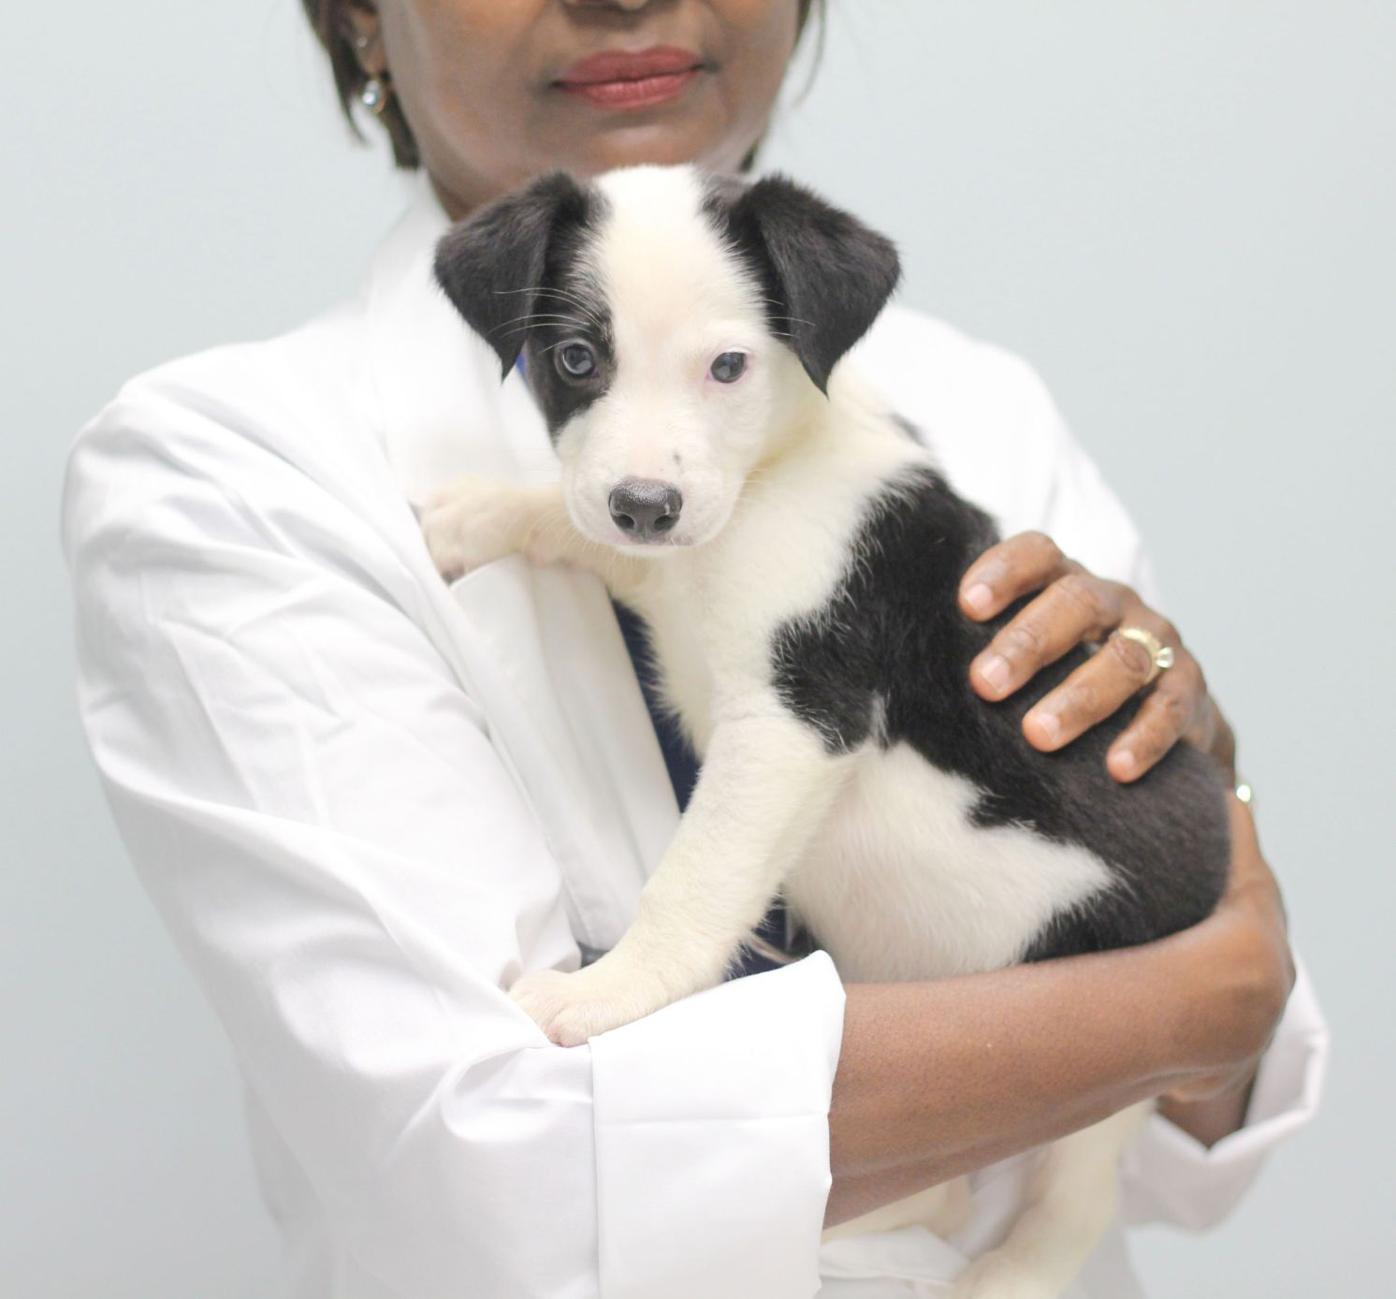 042220_MNS_AHS_foster_001 Gloria Dorsey with dog